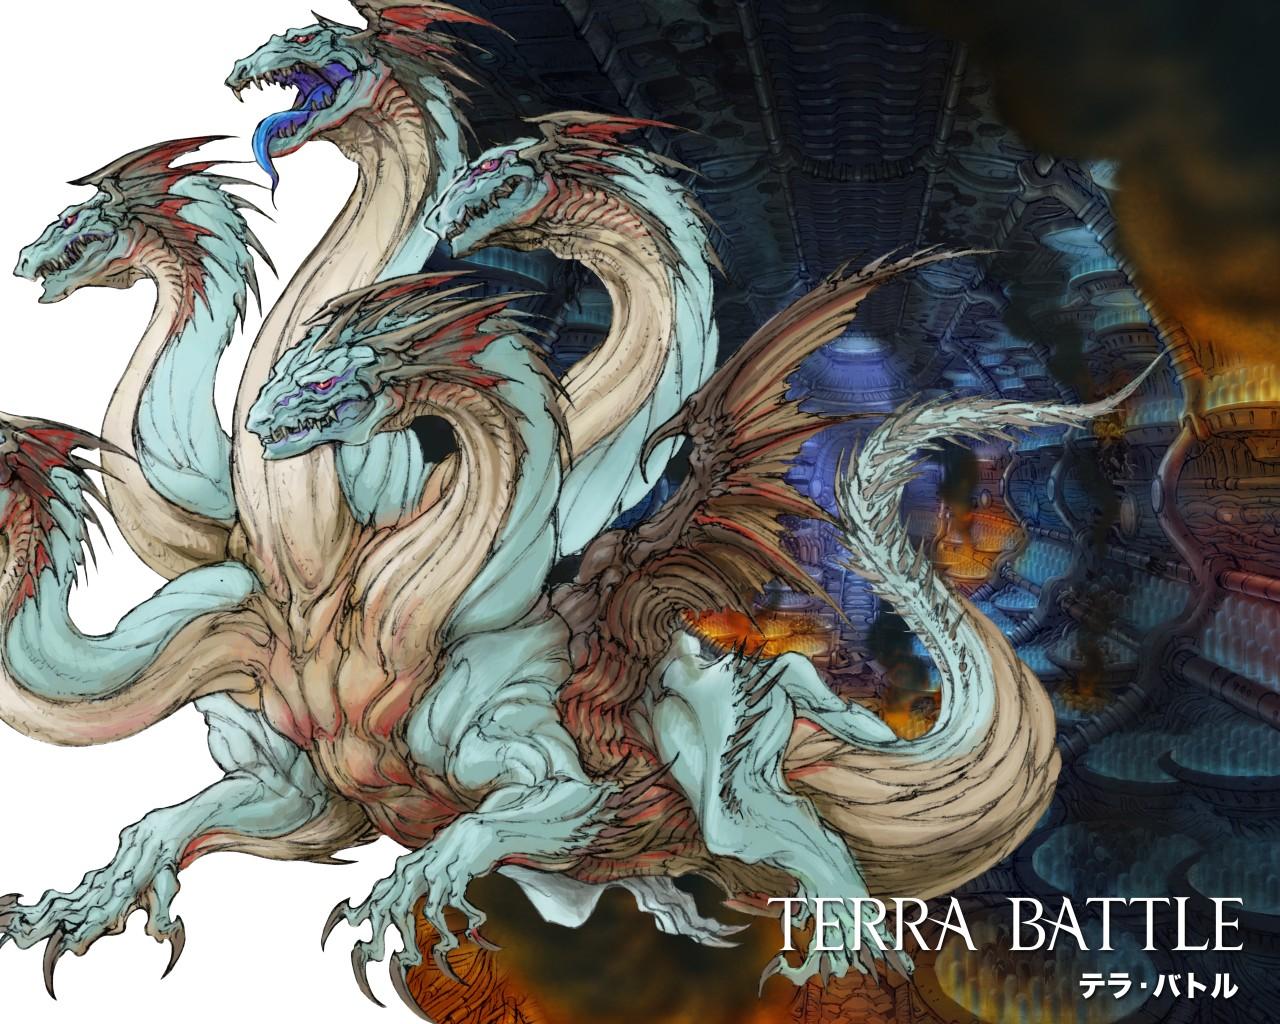 Terra-Battle_2014_08-27-14_025